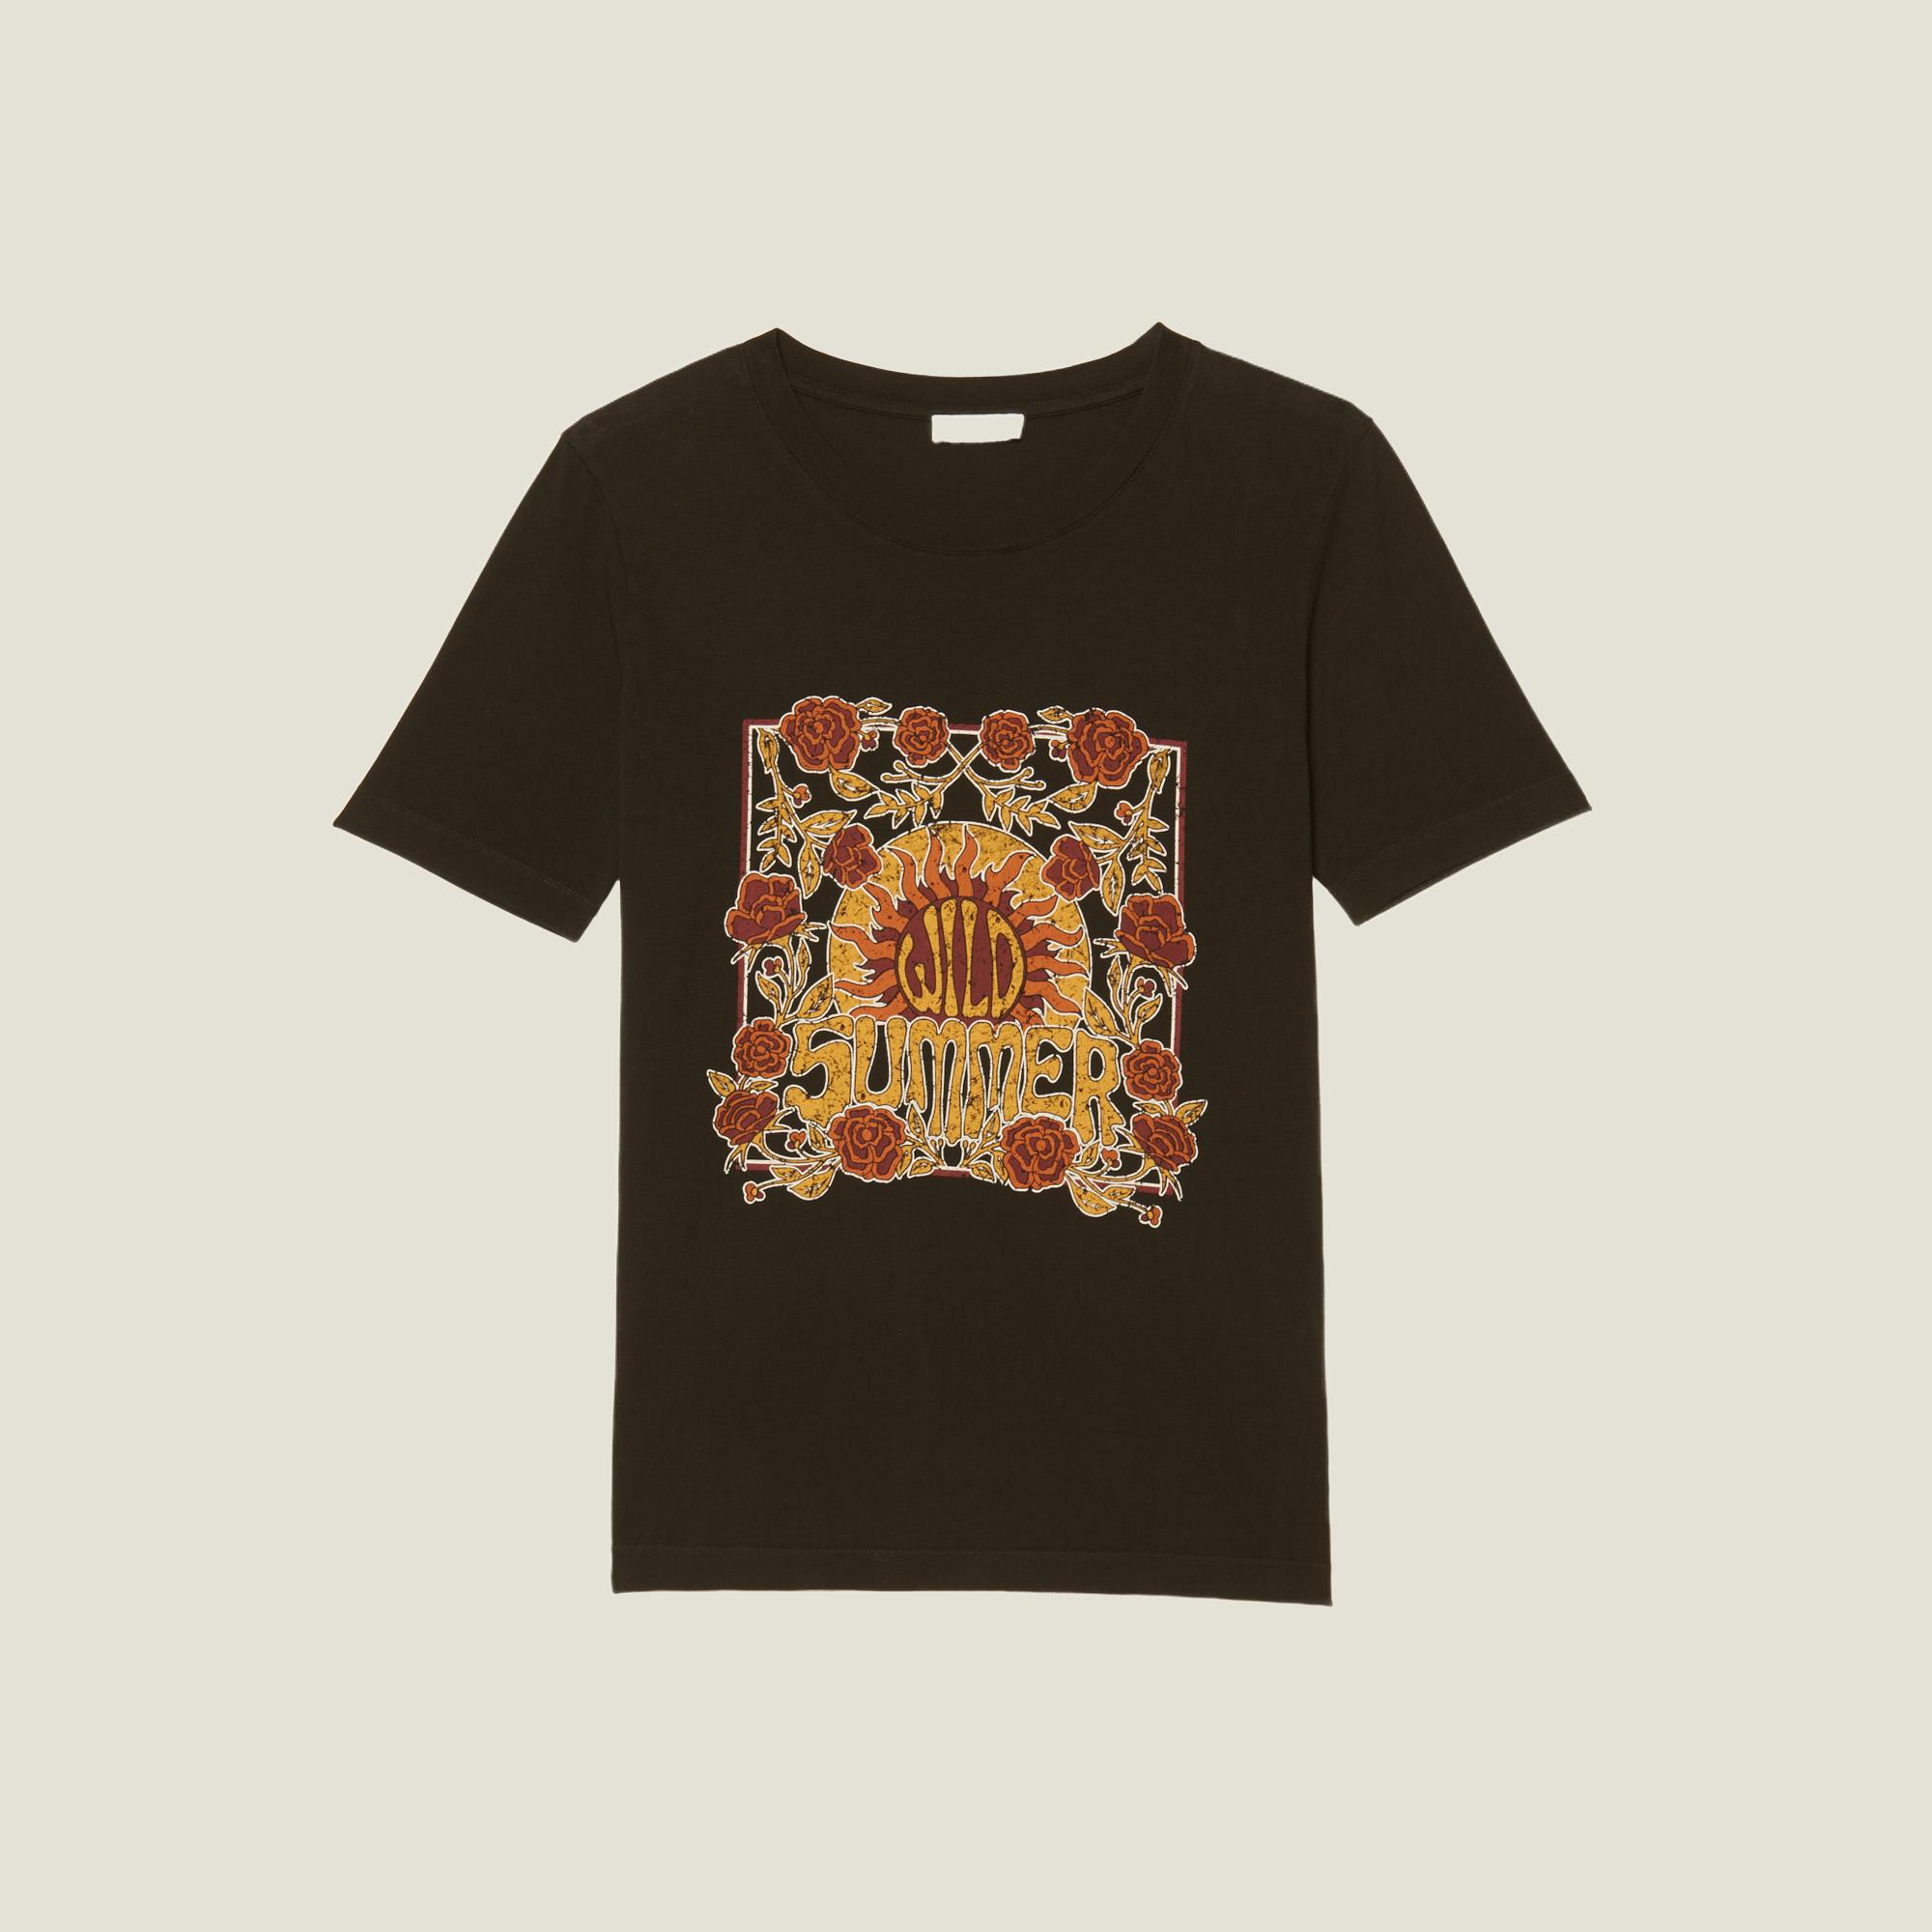 8b96484ce ... T-Shirt With Block Motif : Tops & Shirts color Black